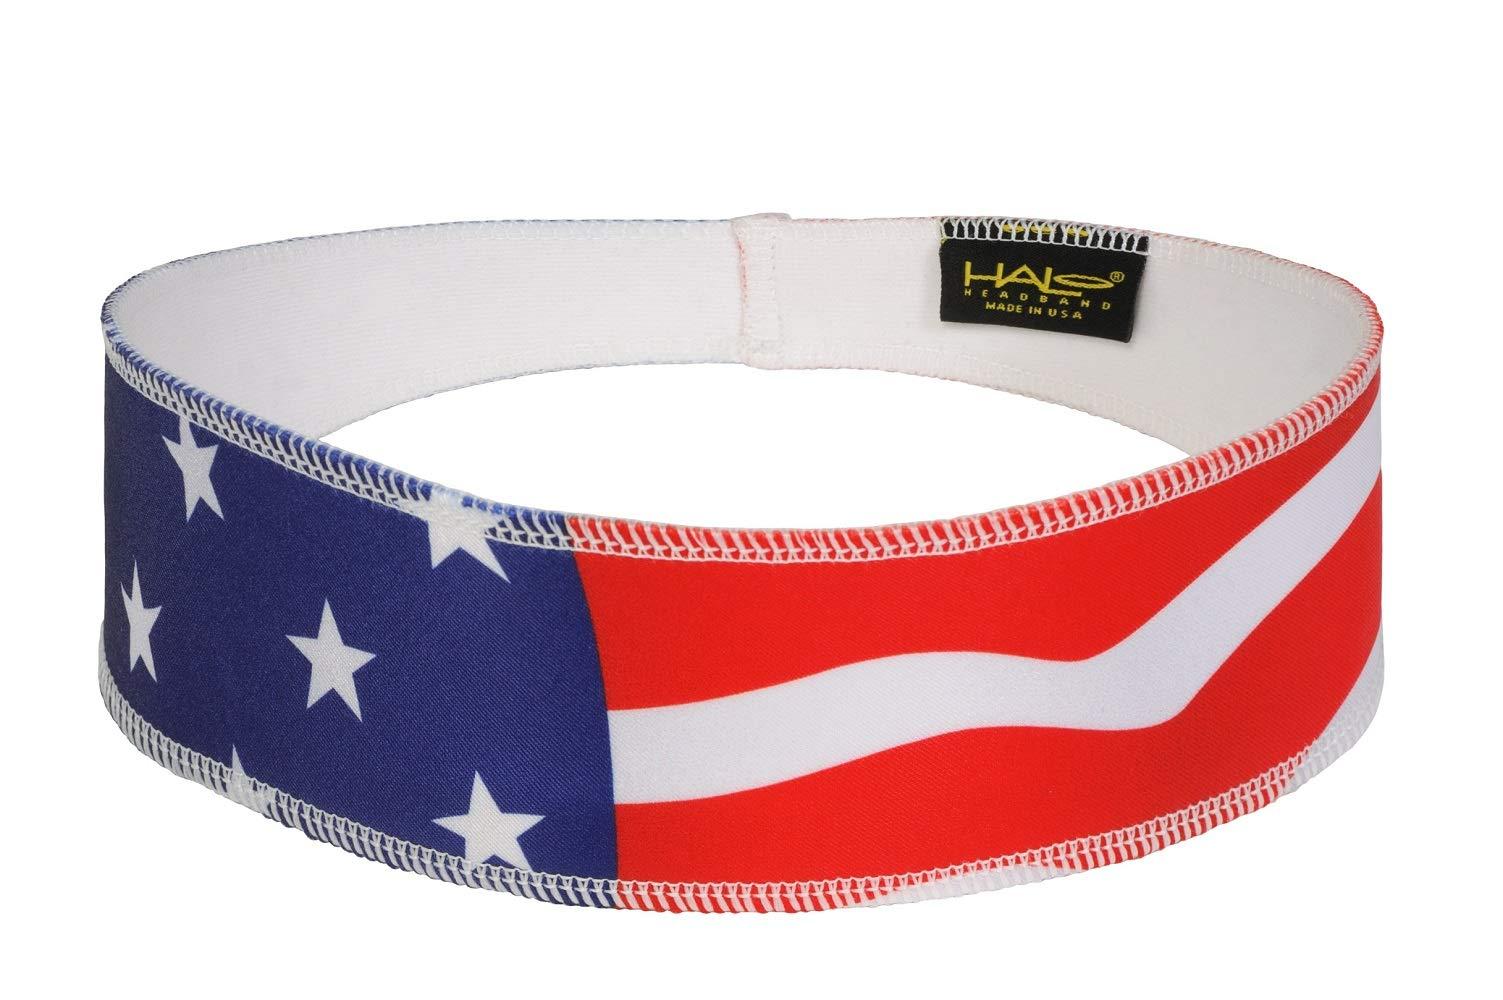 Halo II Headband Sweatband Pullover USA Flag by Halo Headbands